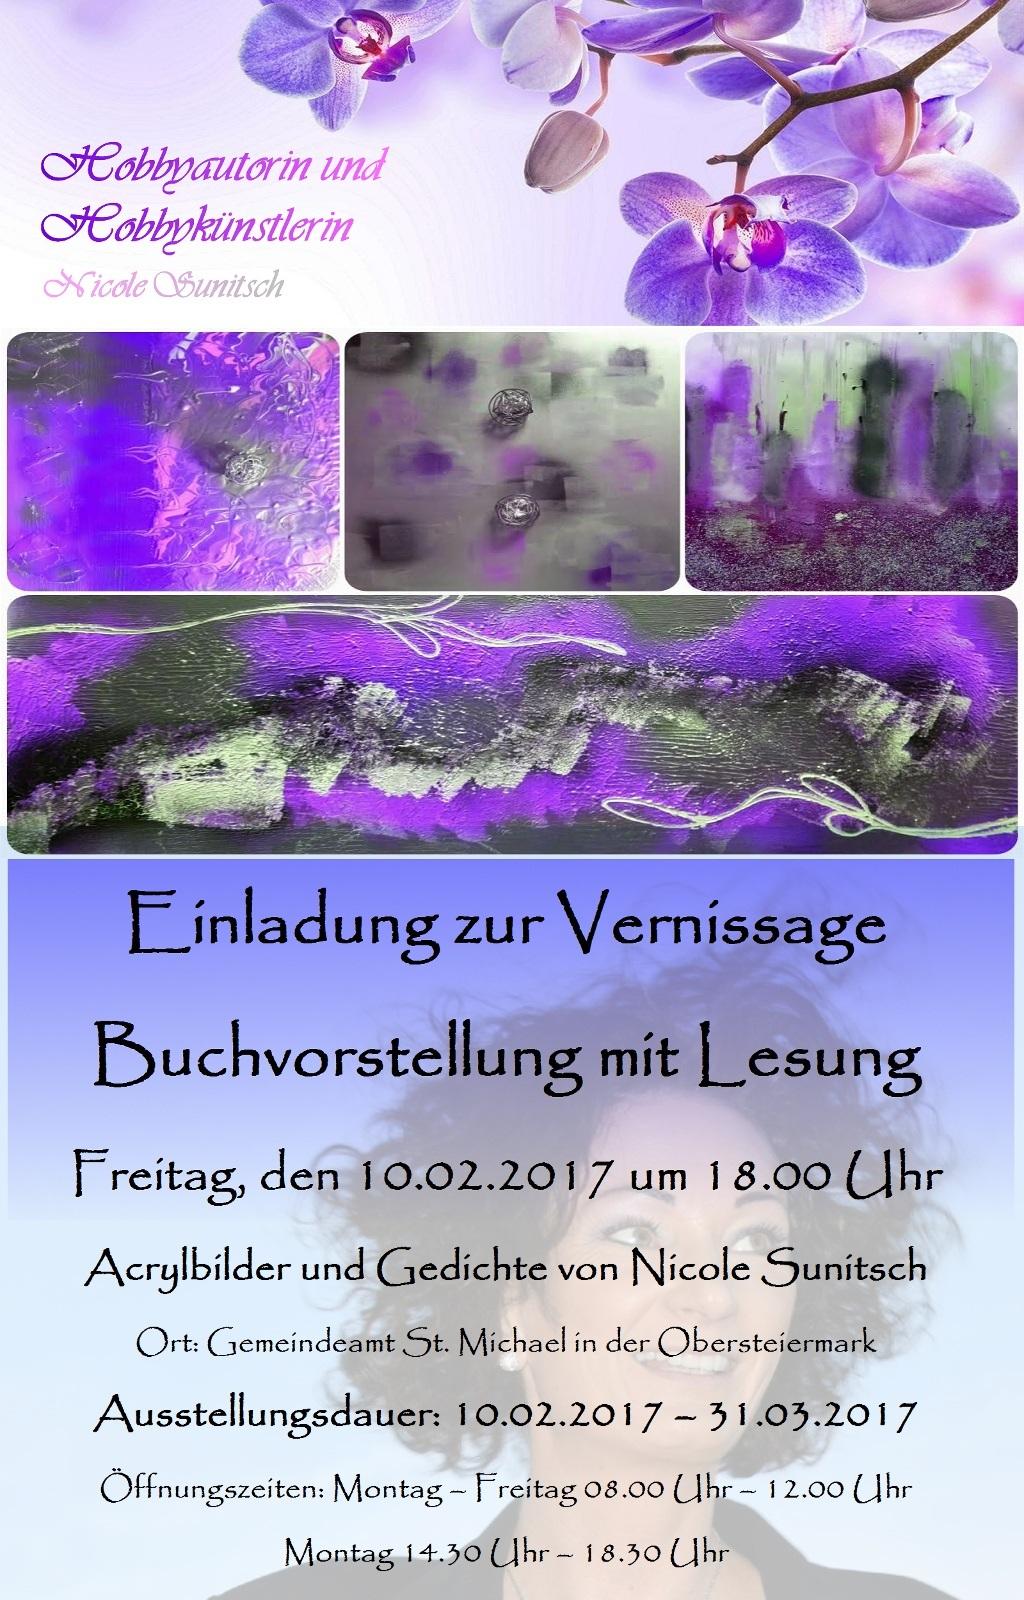 nicole sunitsch - autorin - hobbyautorin - hobbykünstlerin, Einladung